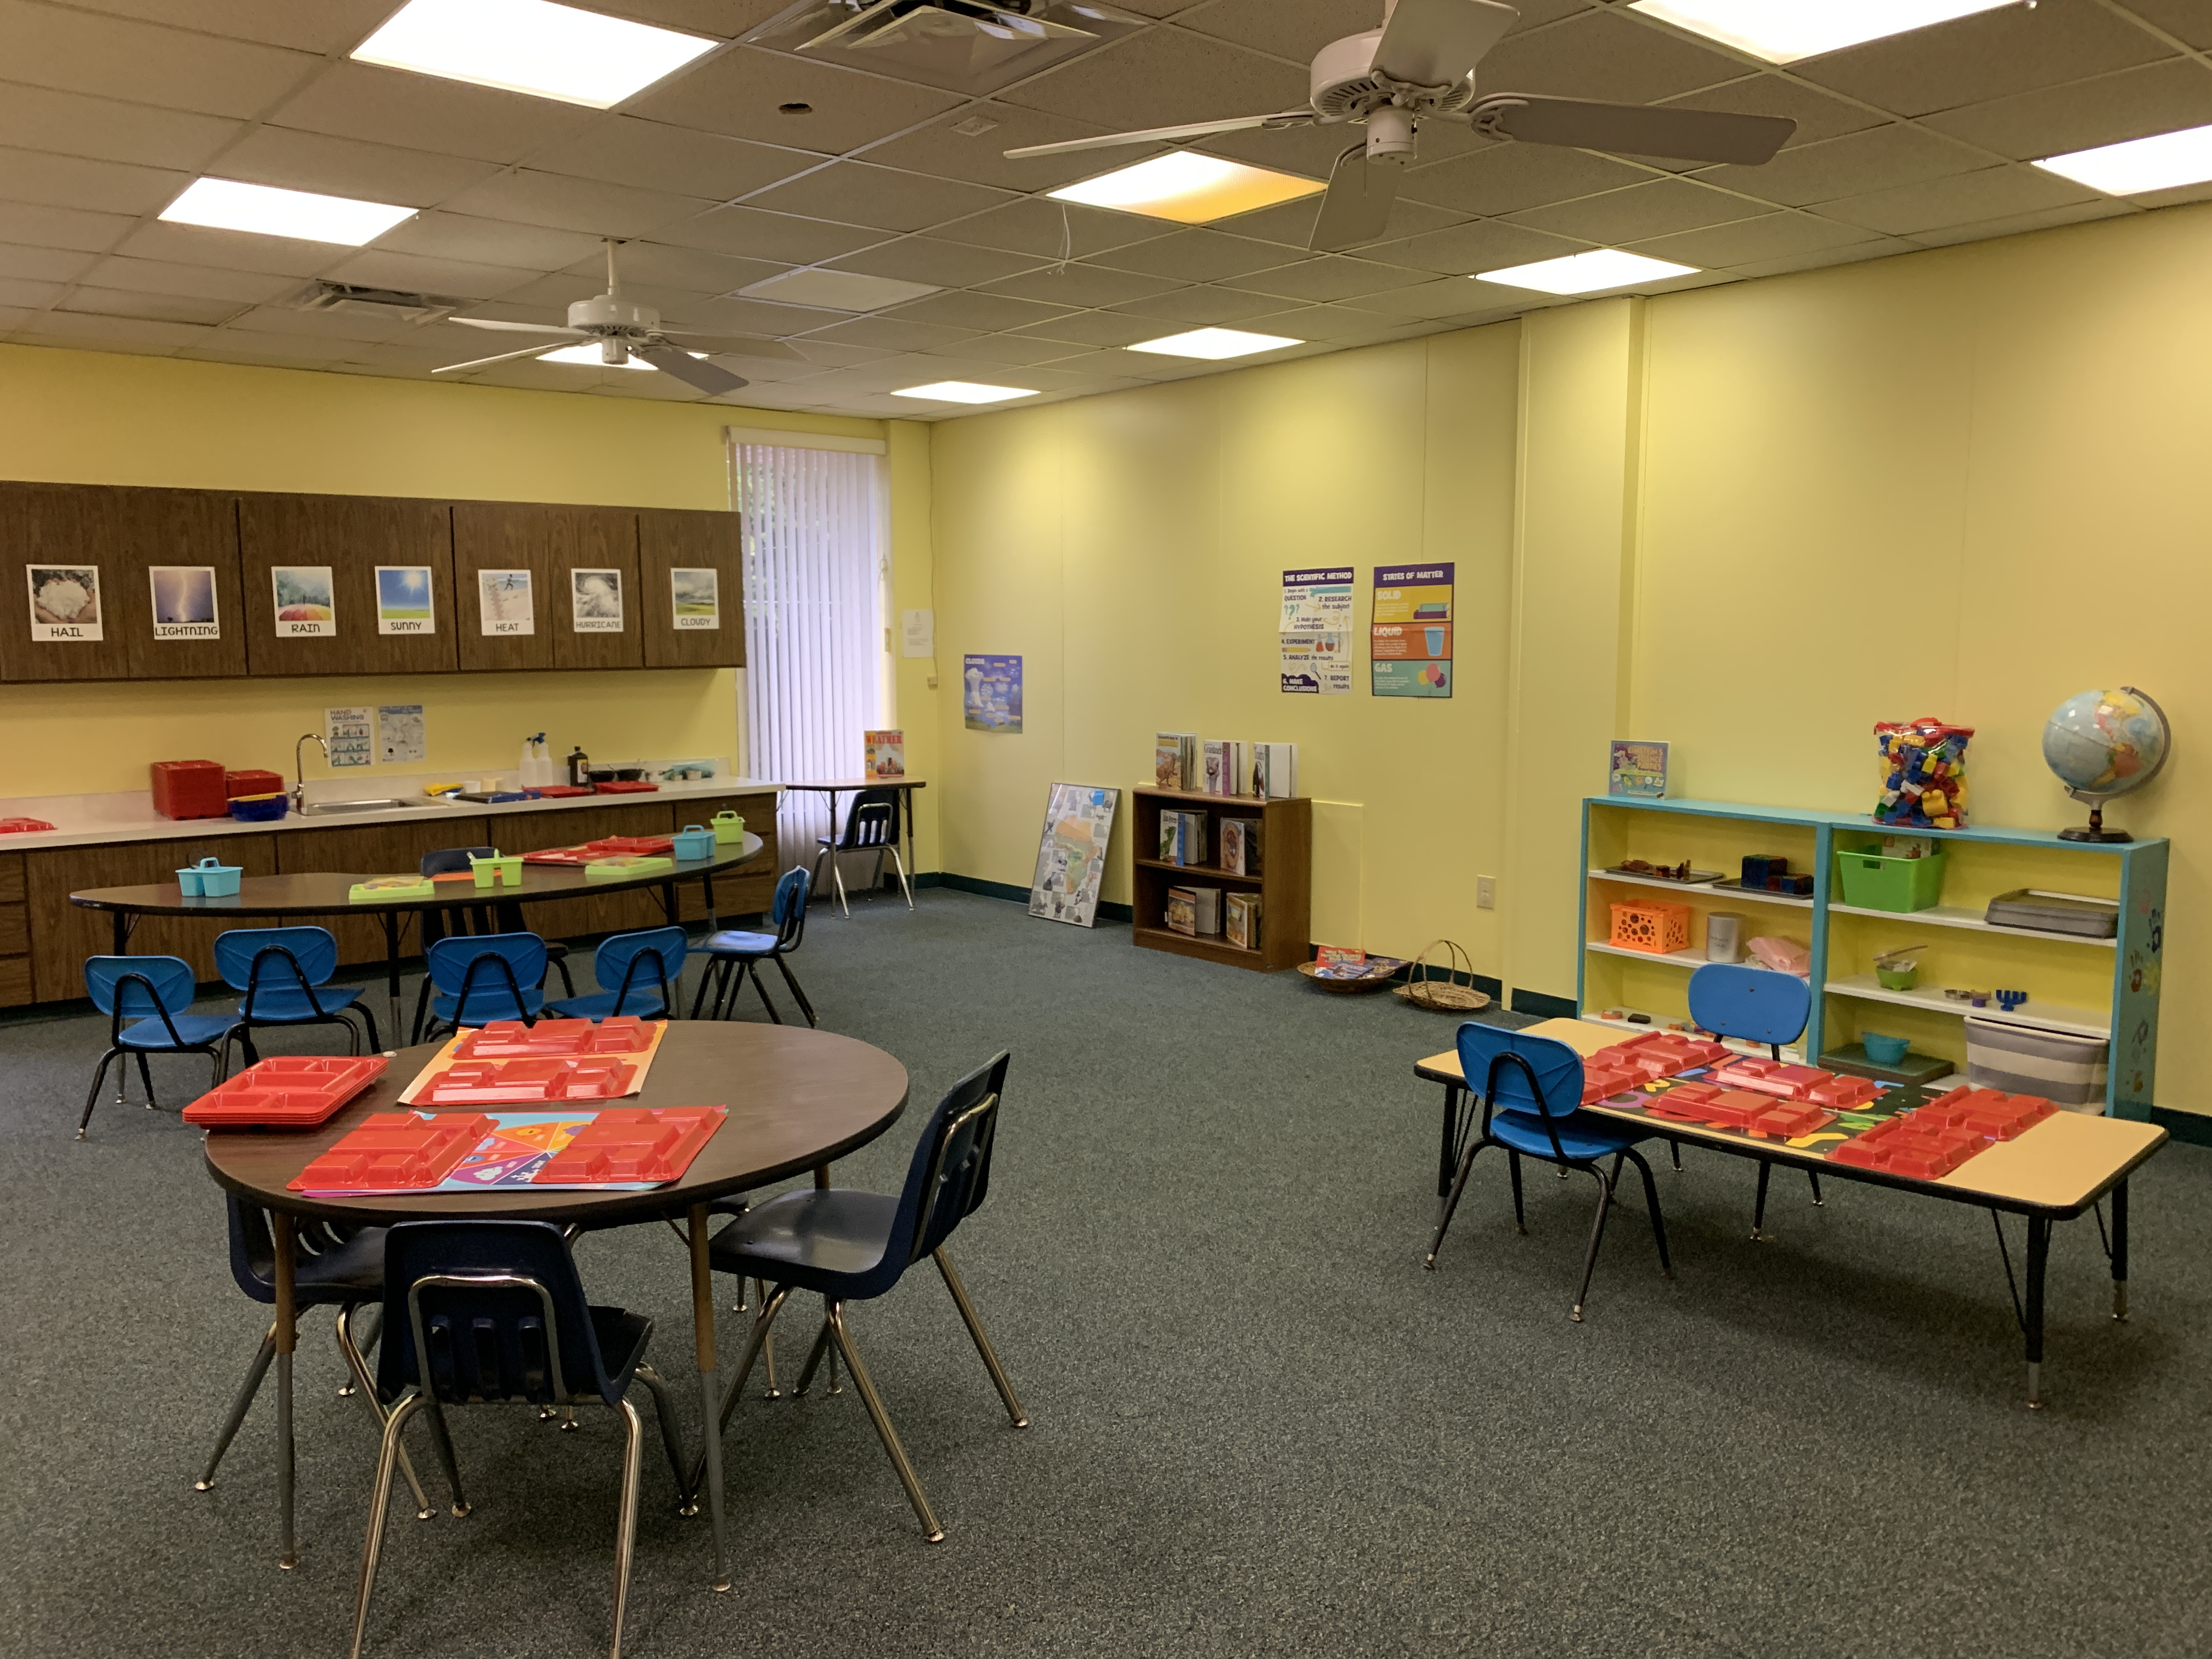 The STEM Room